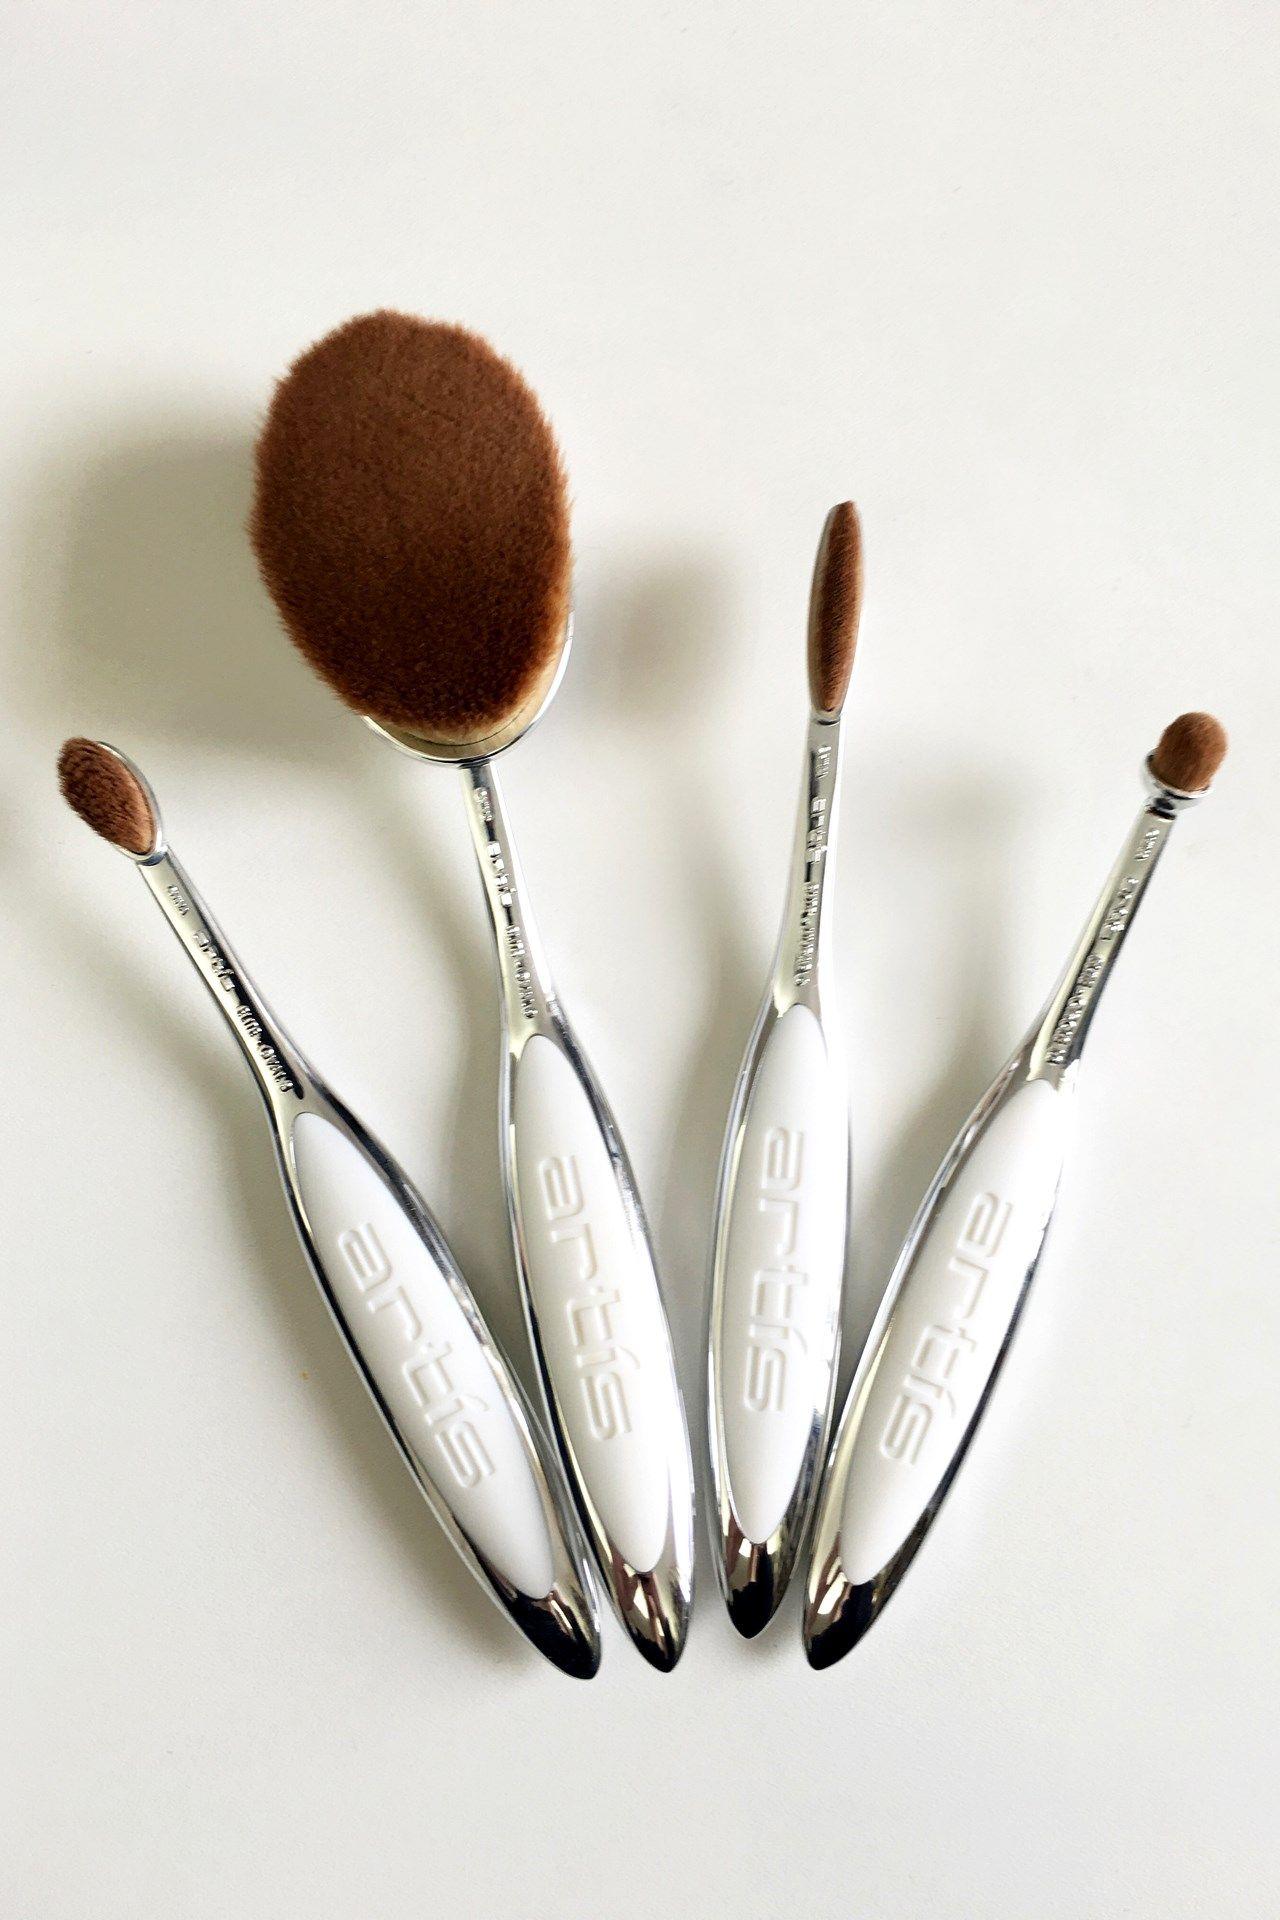 Weekly Wonder Artis Brushes Artis brushes, Beauty